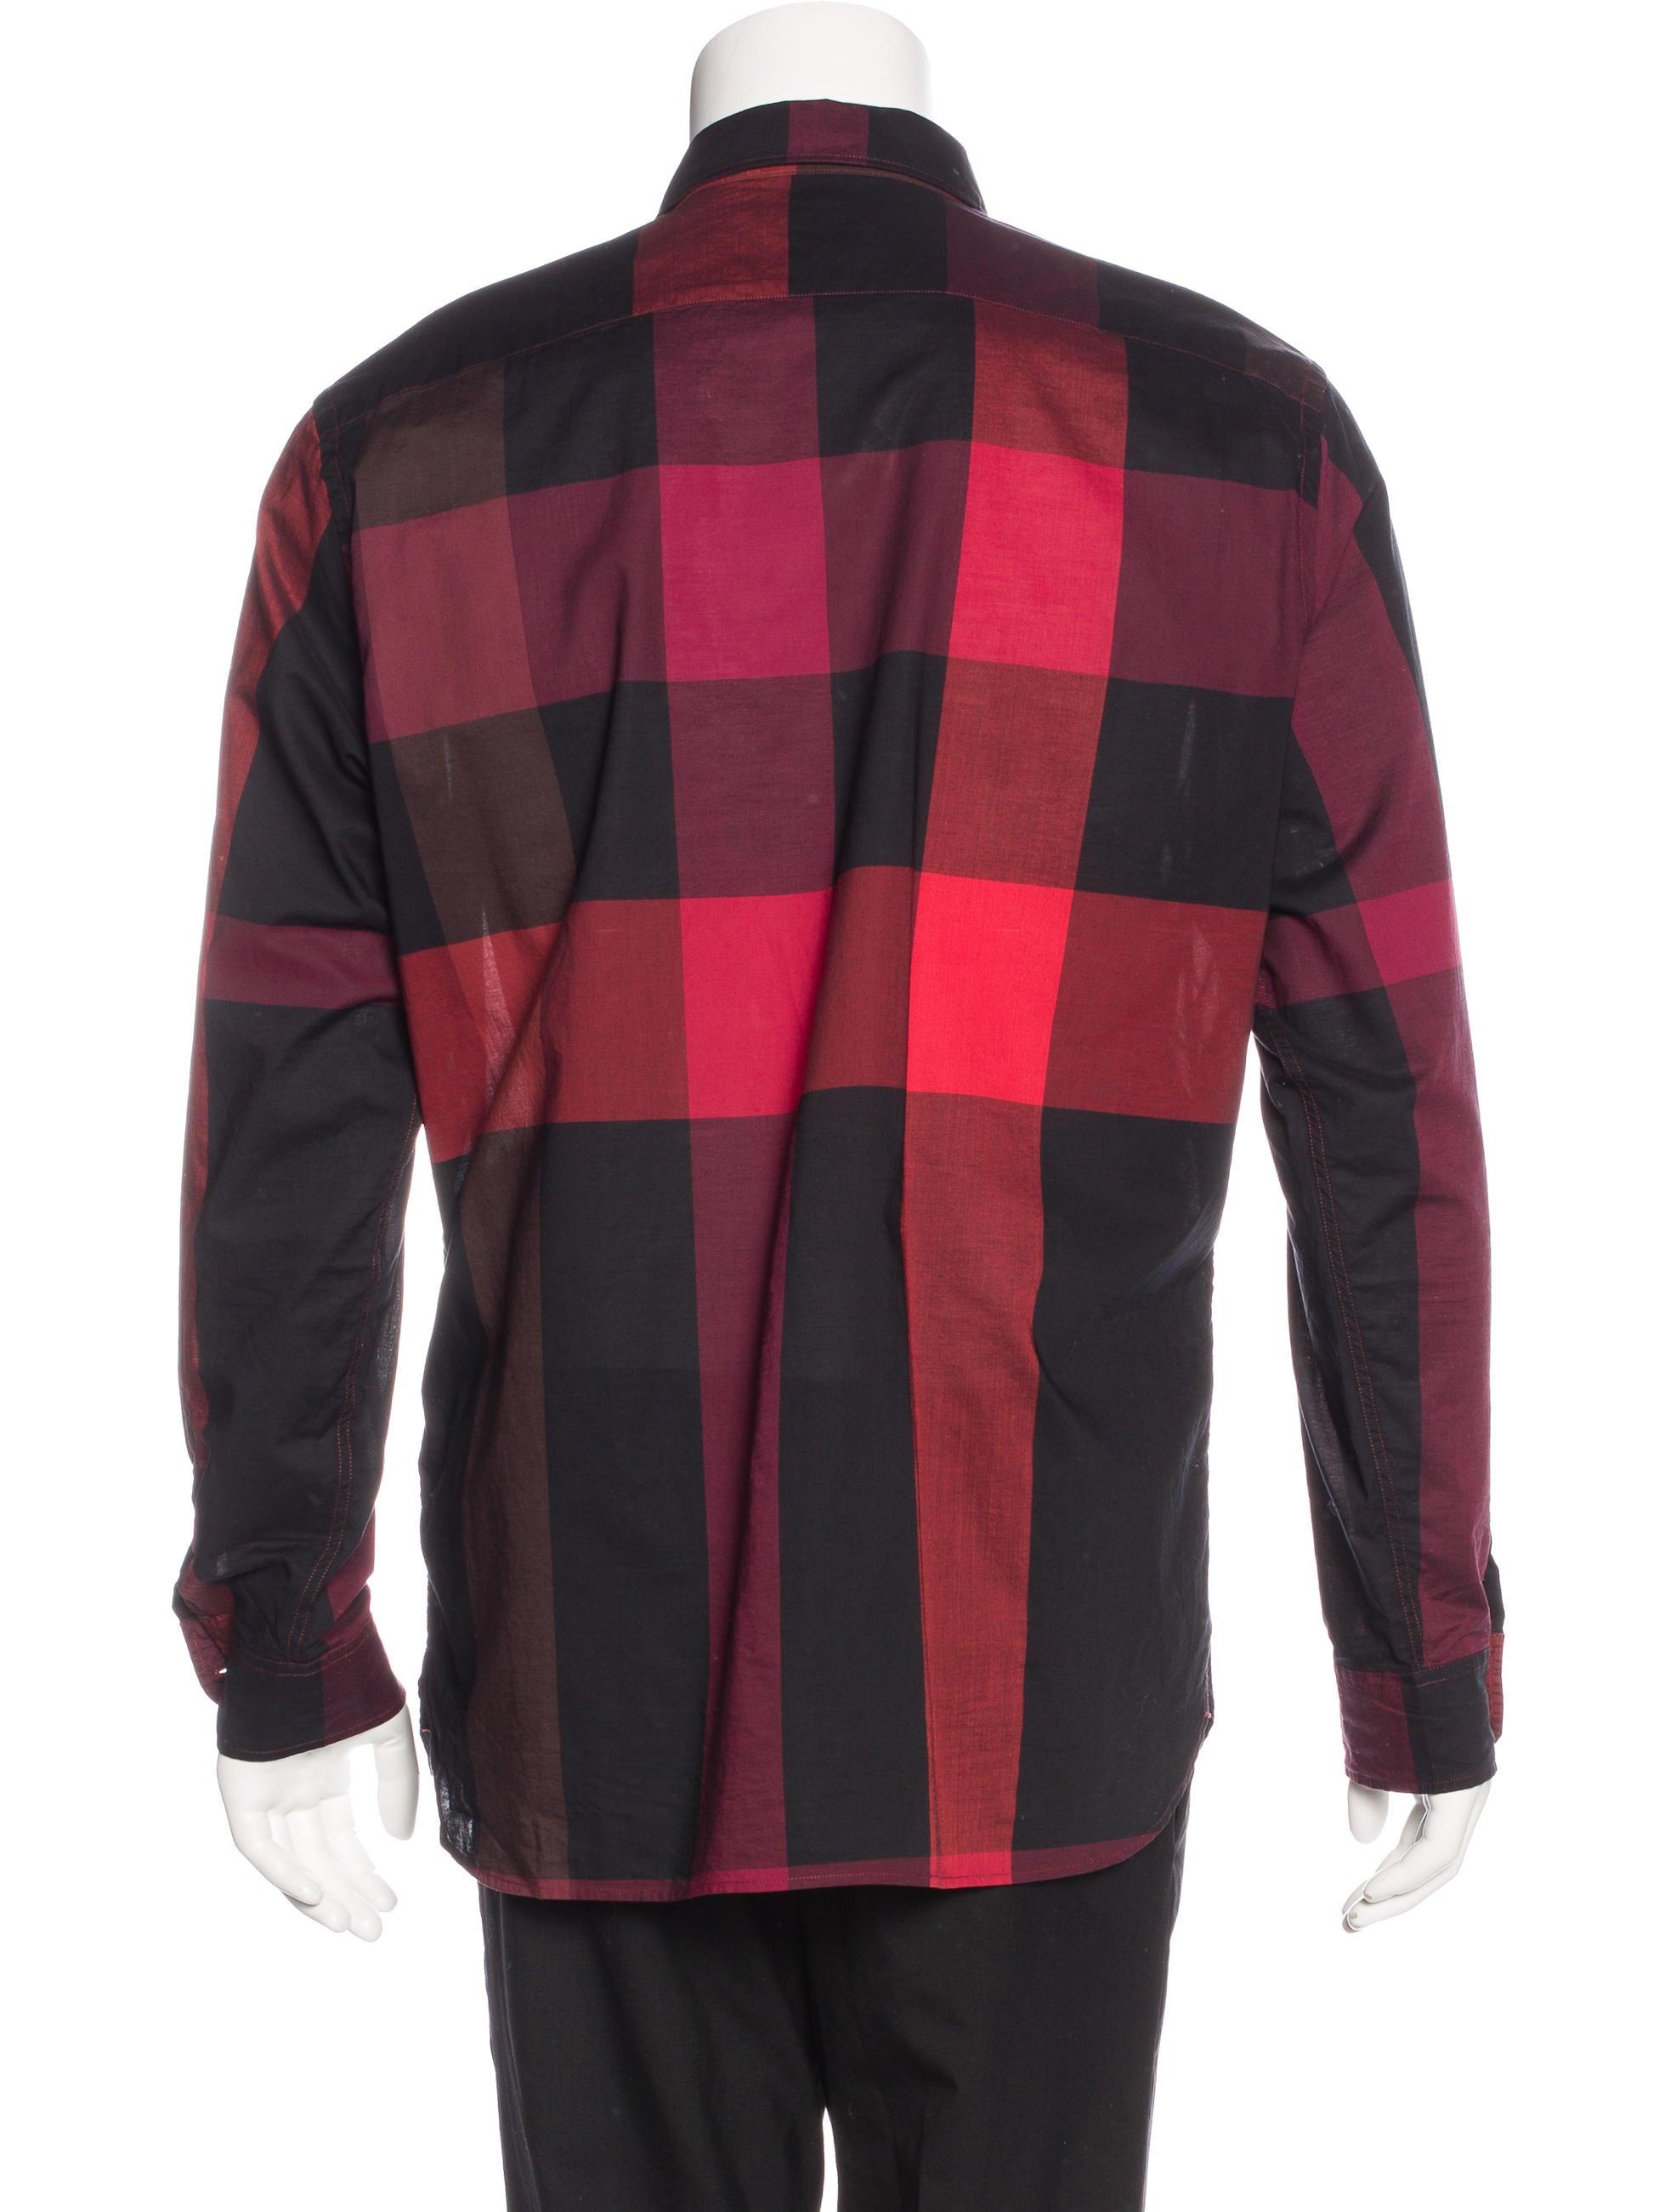 Burberry Brit Plaid Woven Shirt Clothing Bbr27129